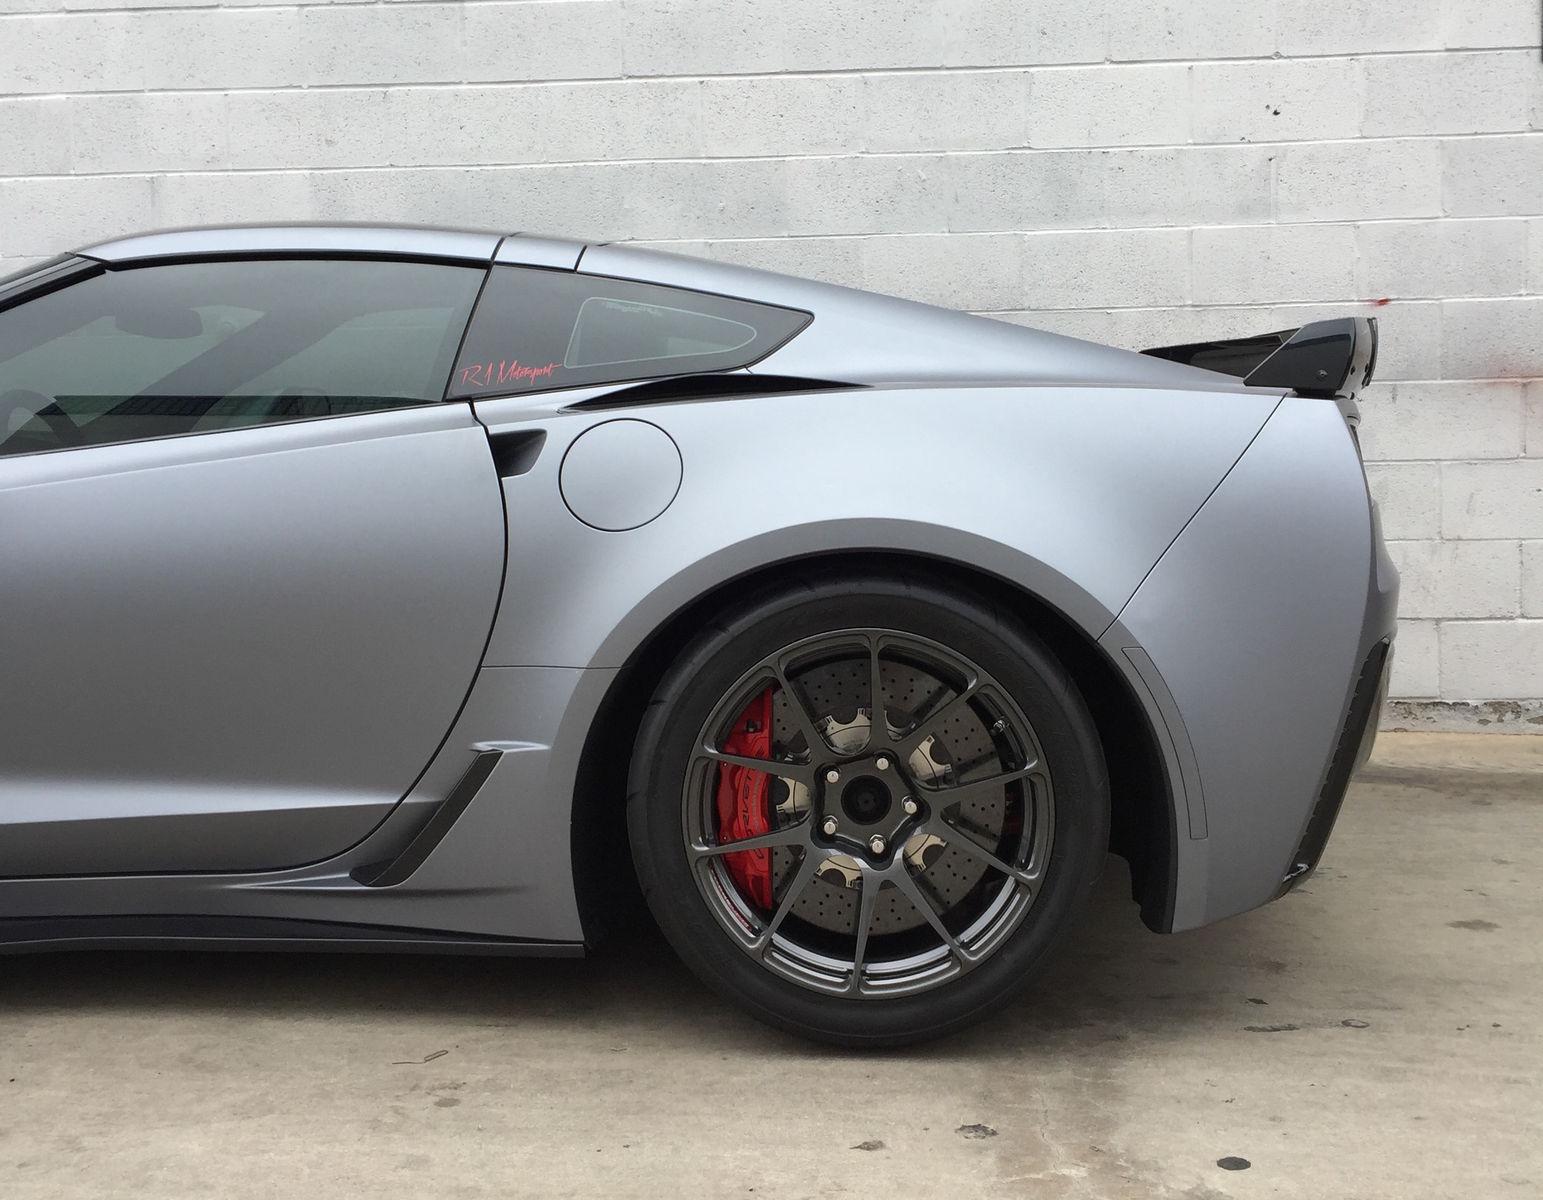 2016 Chevrolet Corvette Z06 | Wrapped C7 Corvette Z06 on Forgeline One Piece Forged Monoblock GA1R Open Lug Wheels from R1 Motorsport